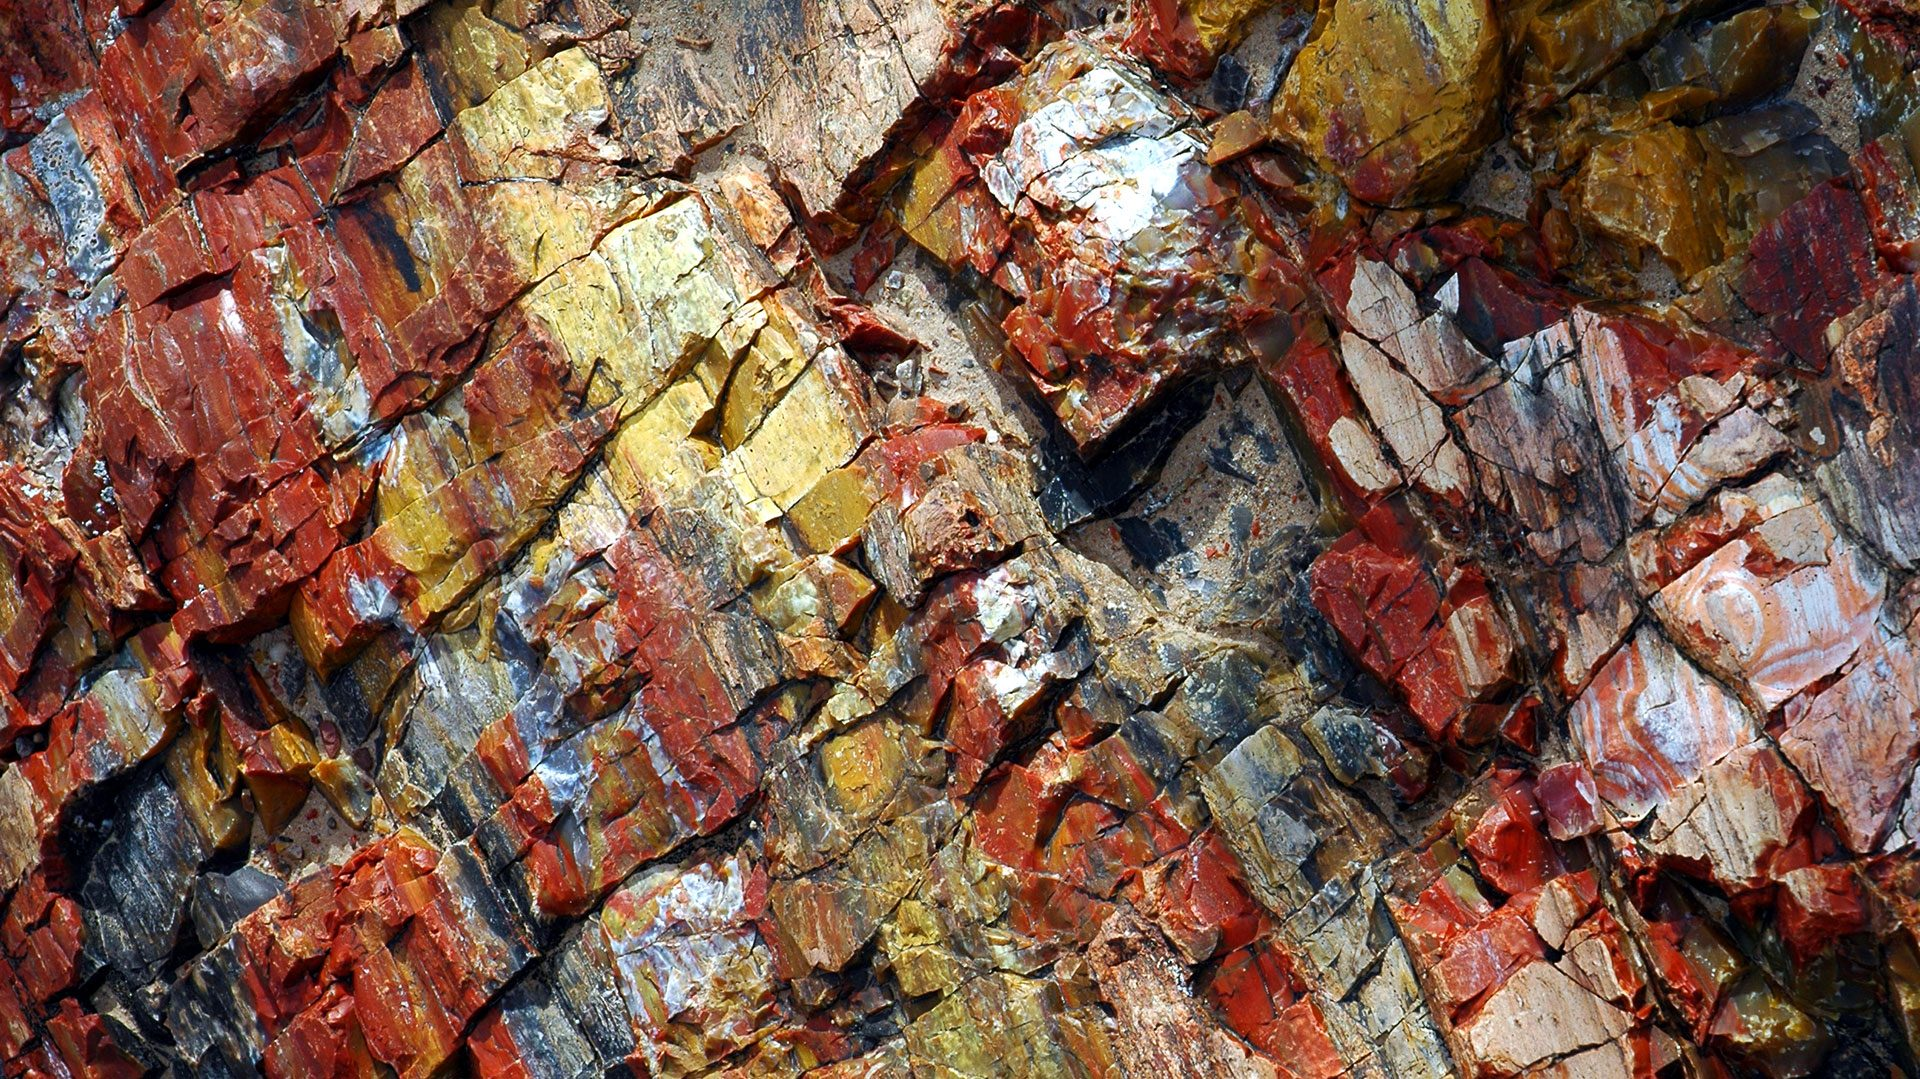 Jasper Crystal Specimen - Mineral Specimen